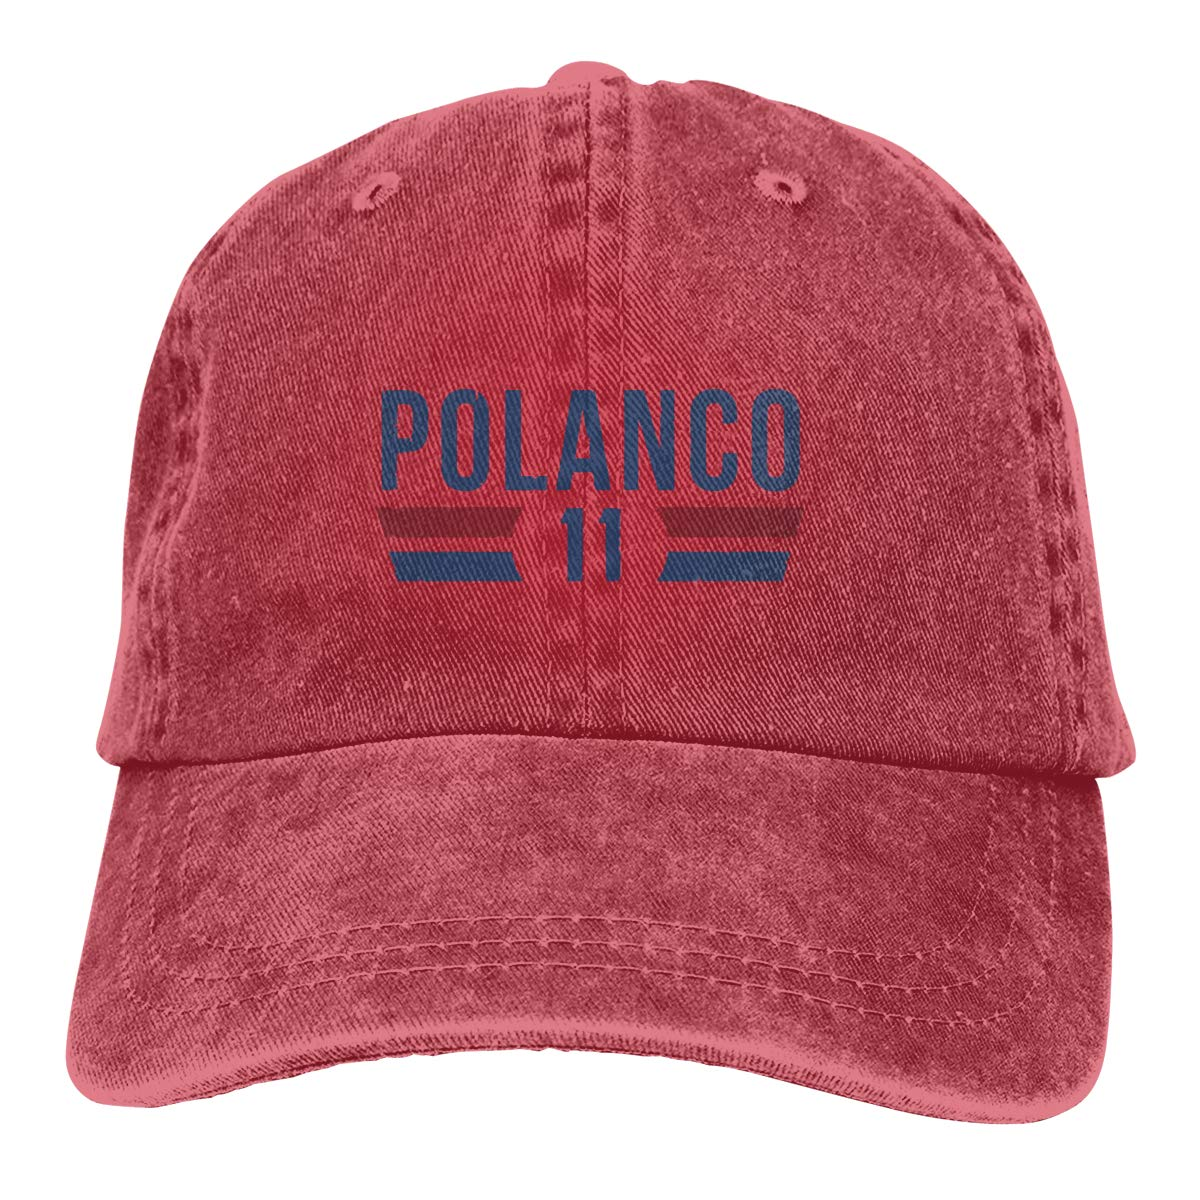 DeniCar Unisex Adjustable Baseball Caps Jorge-Polanco-Logo Cowboy Skull Cap